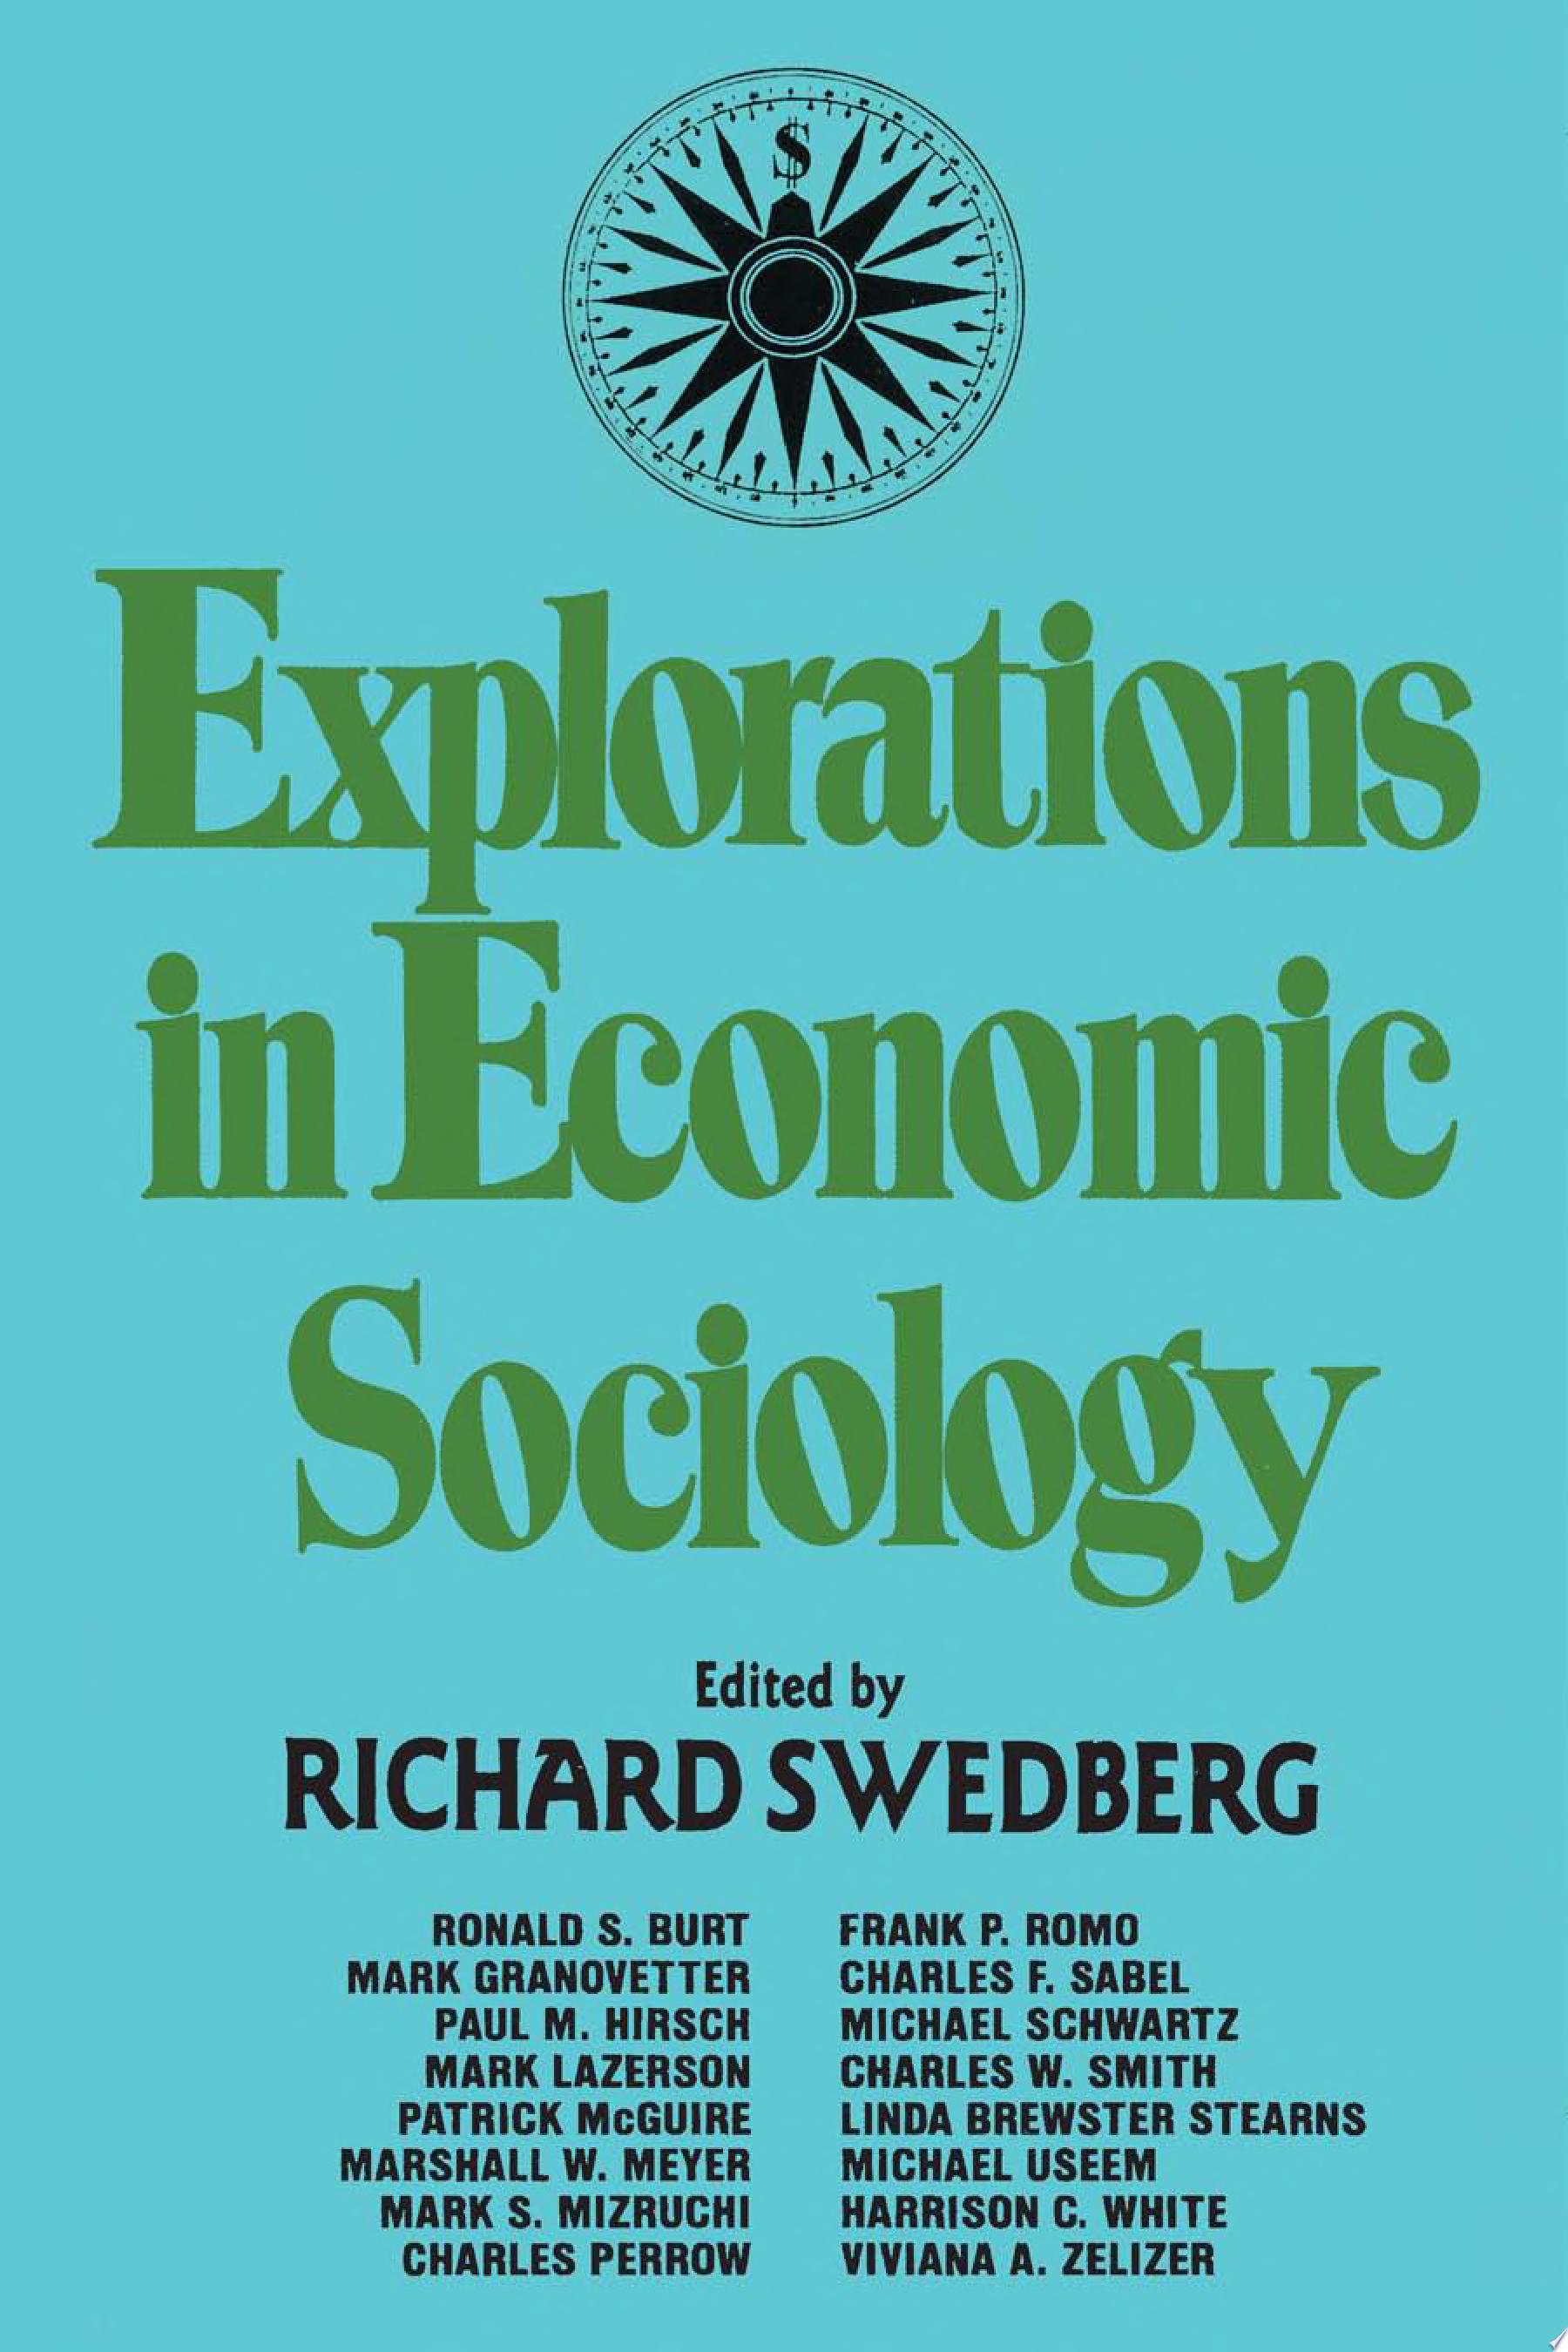 Explorations in Economic Sociology